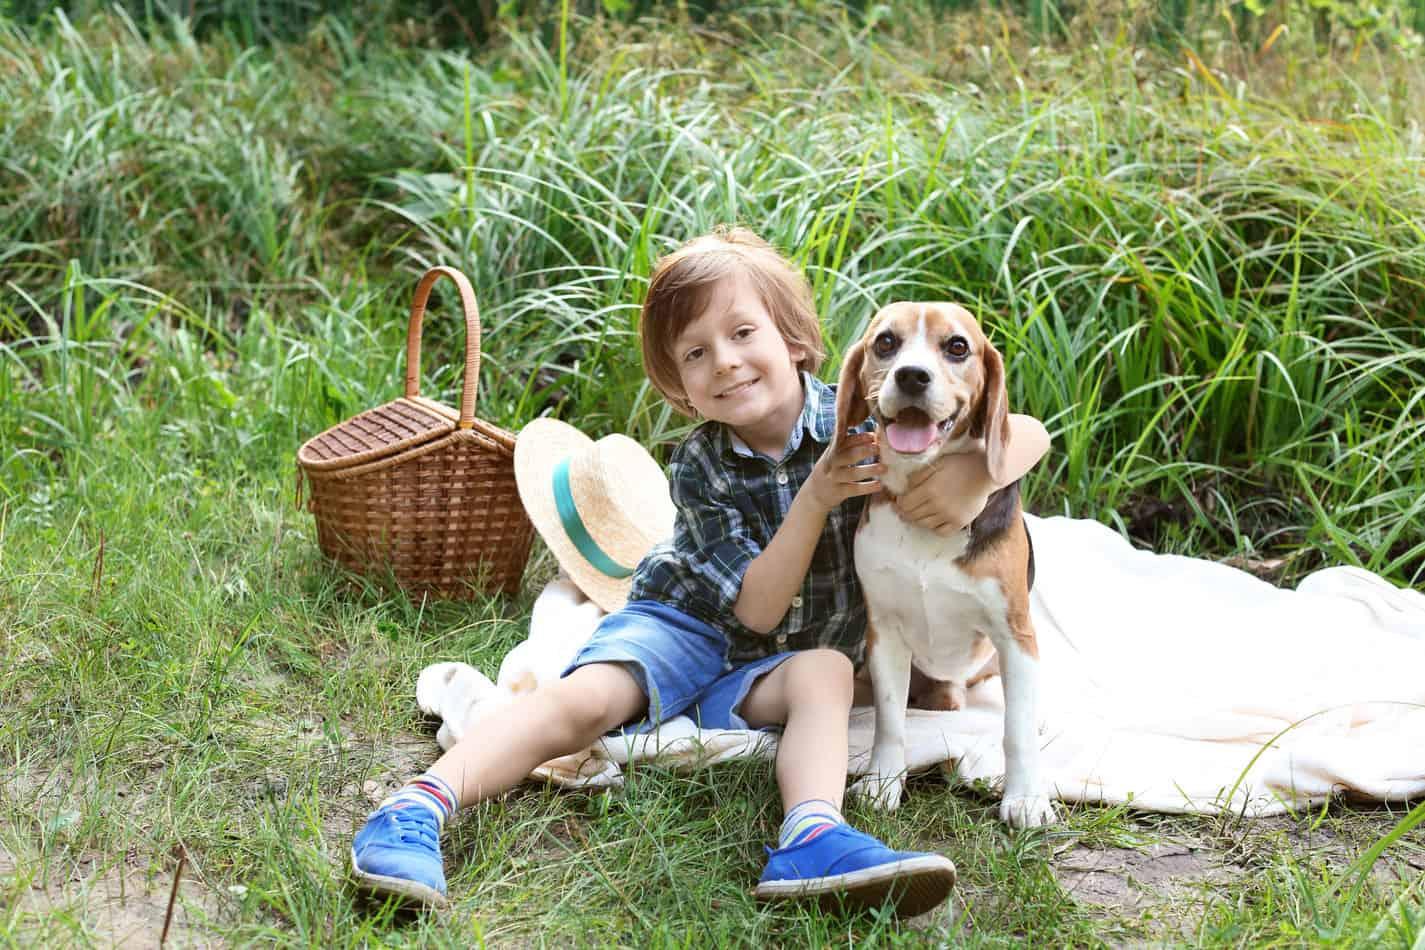 Can Beagles Eat Peanut Butter?